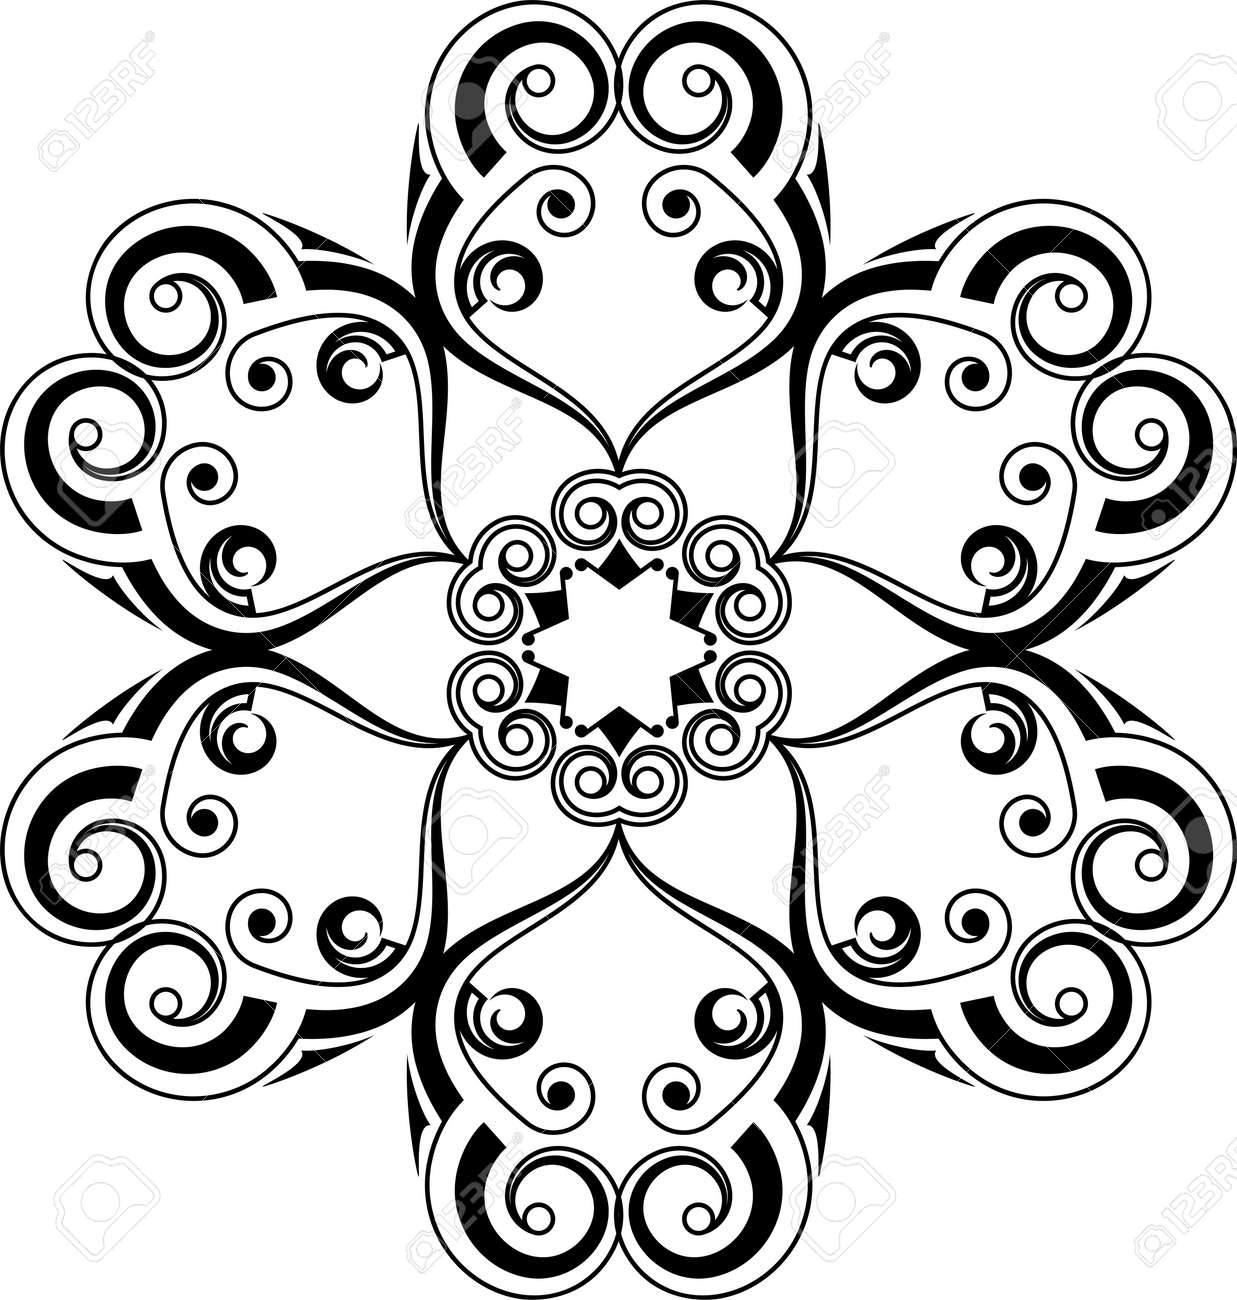 8cf257ceb Circular Tribal Tattoo Design Vector Art Illustration Stock Vector -  96571010